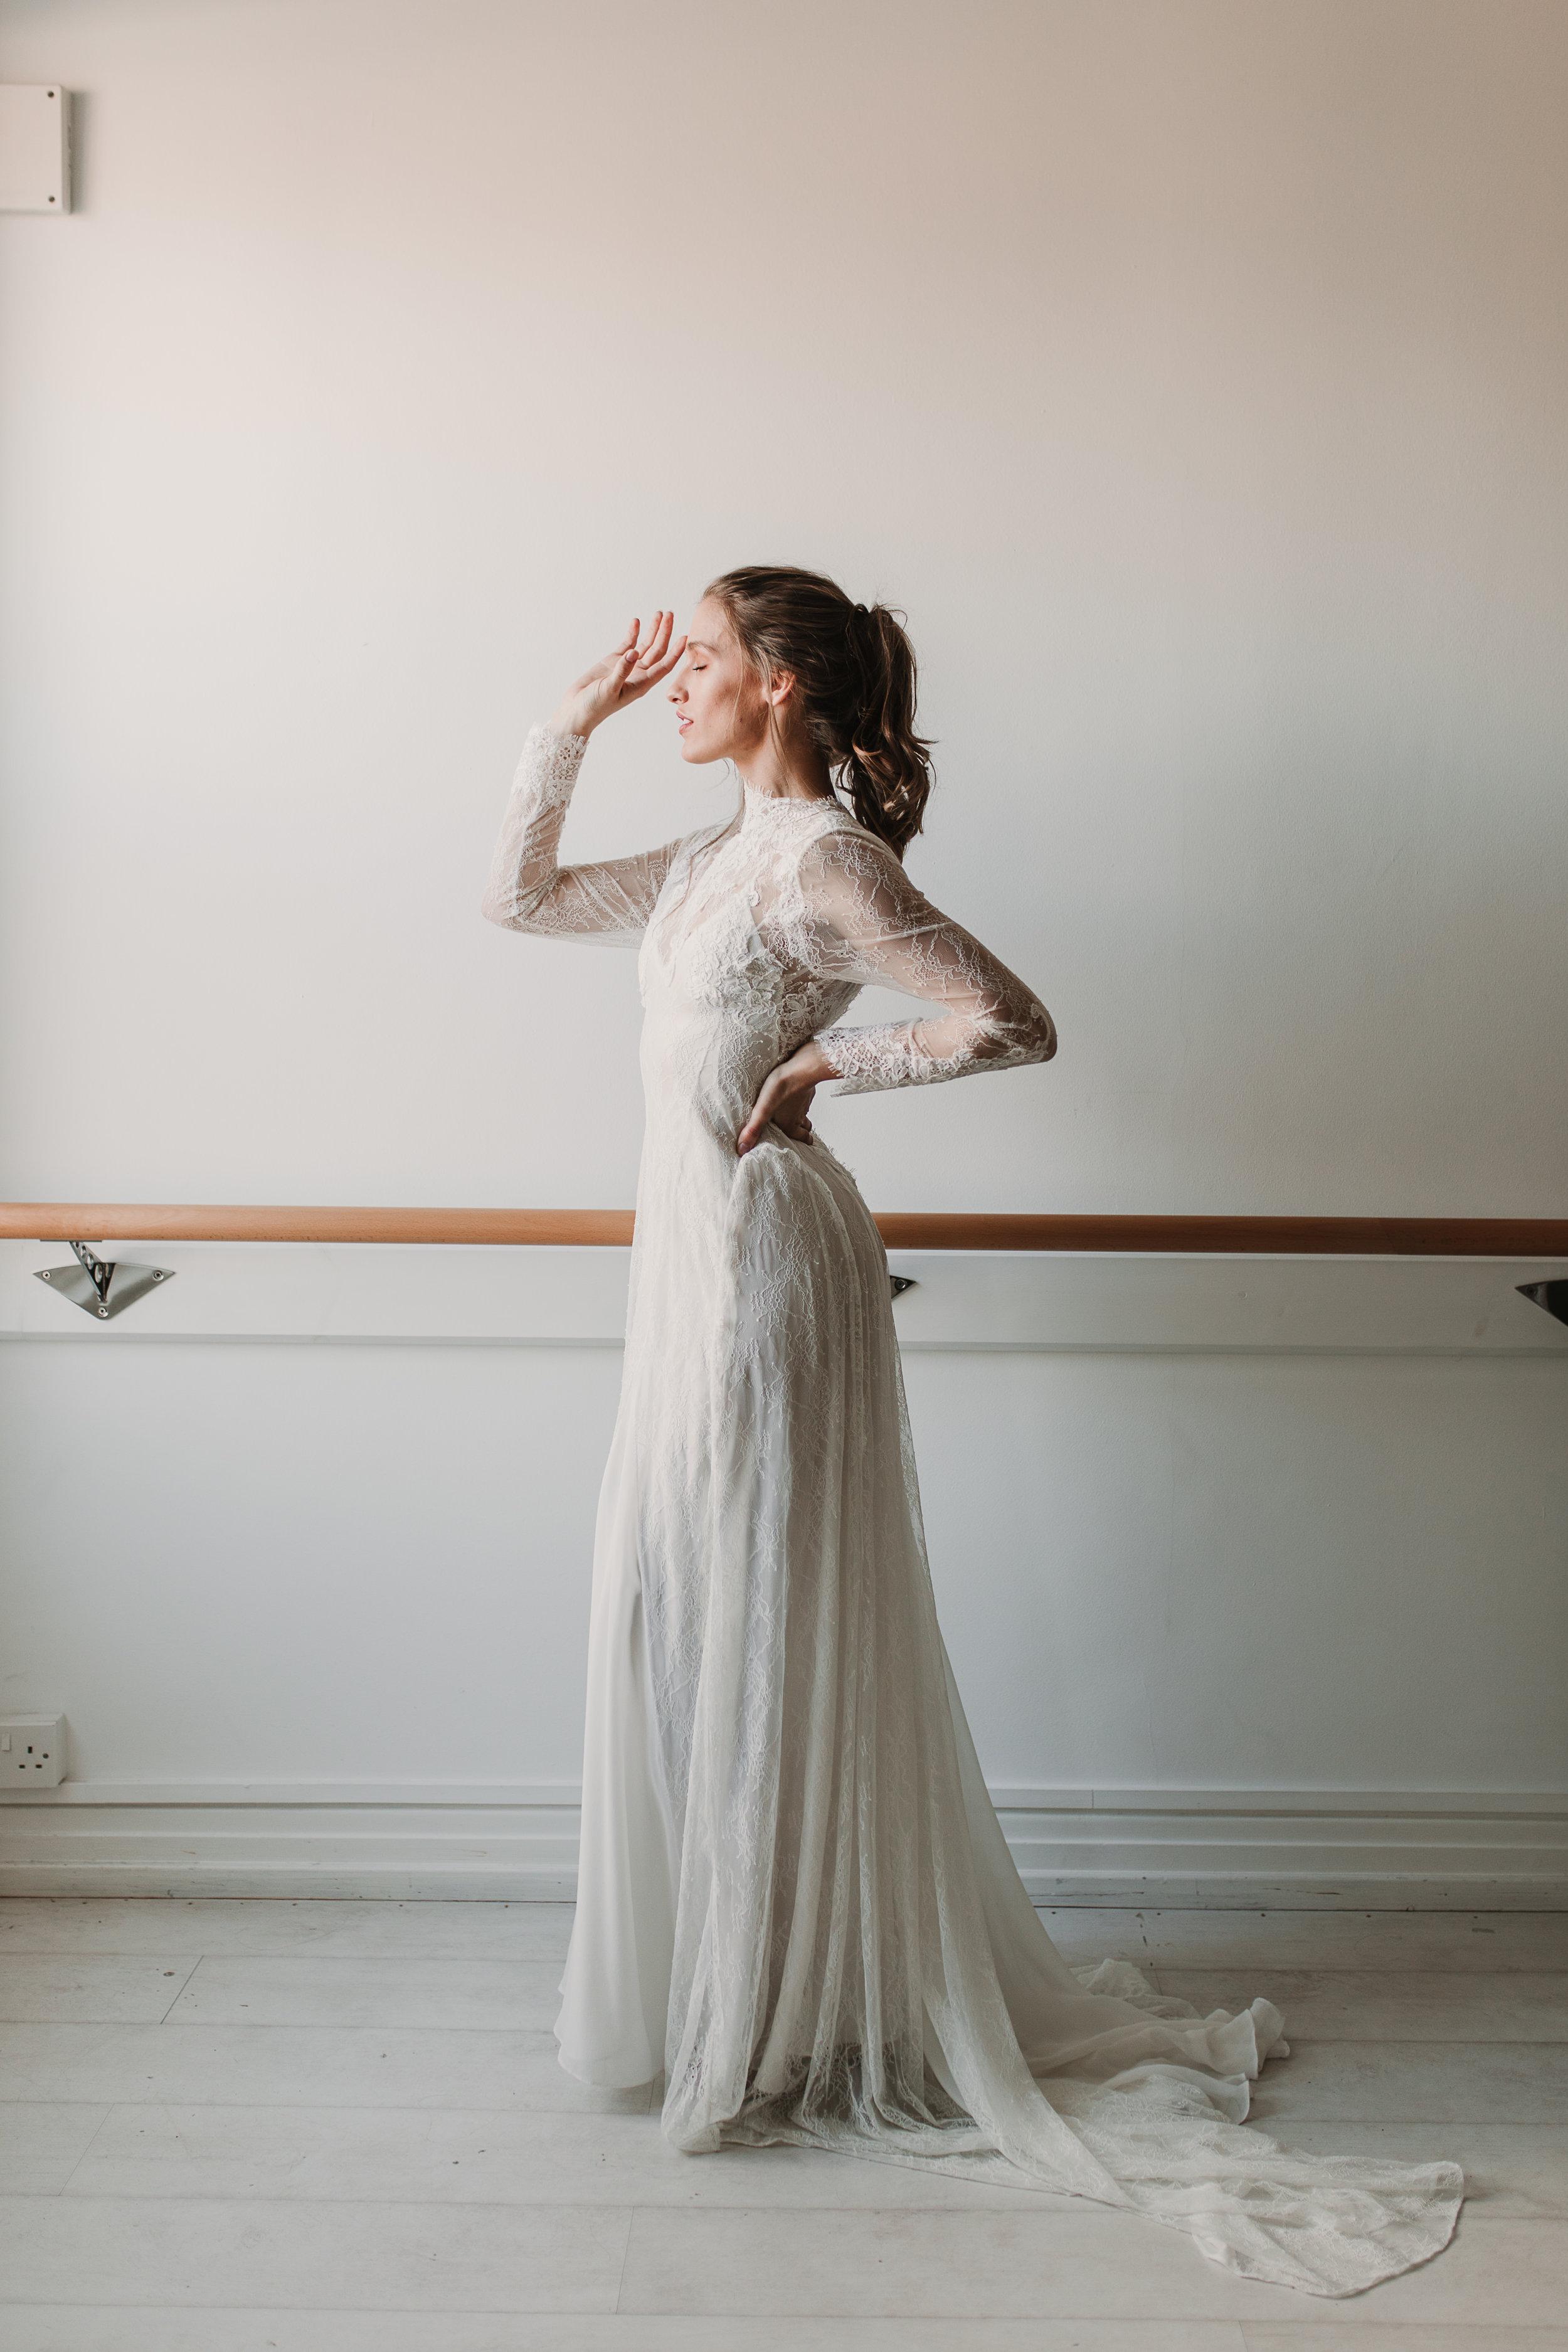 npluck_luna_bride-27.jpg